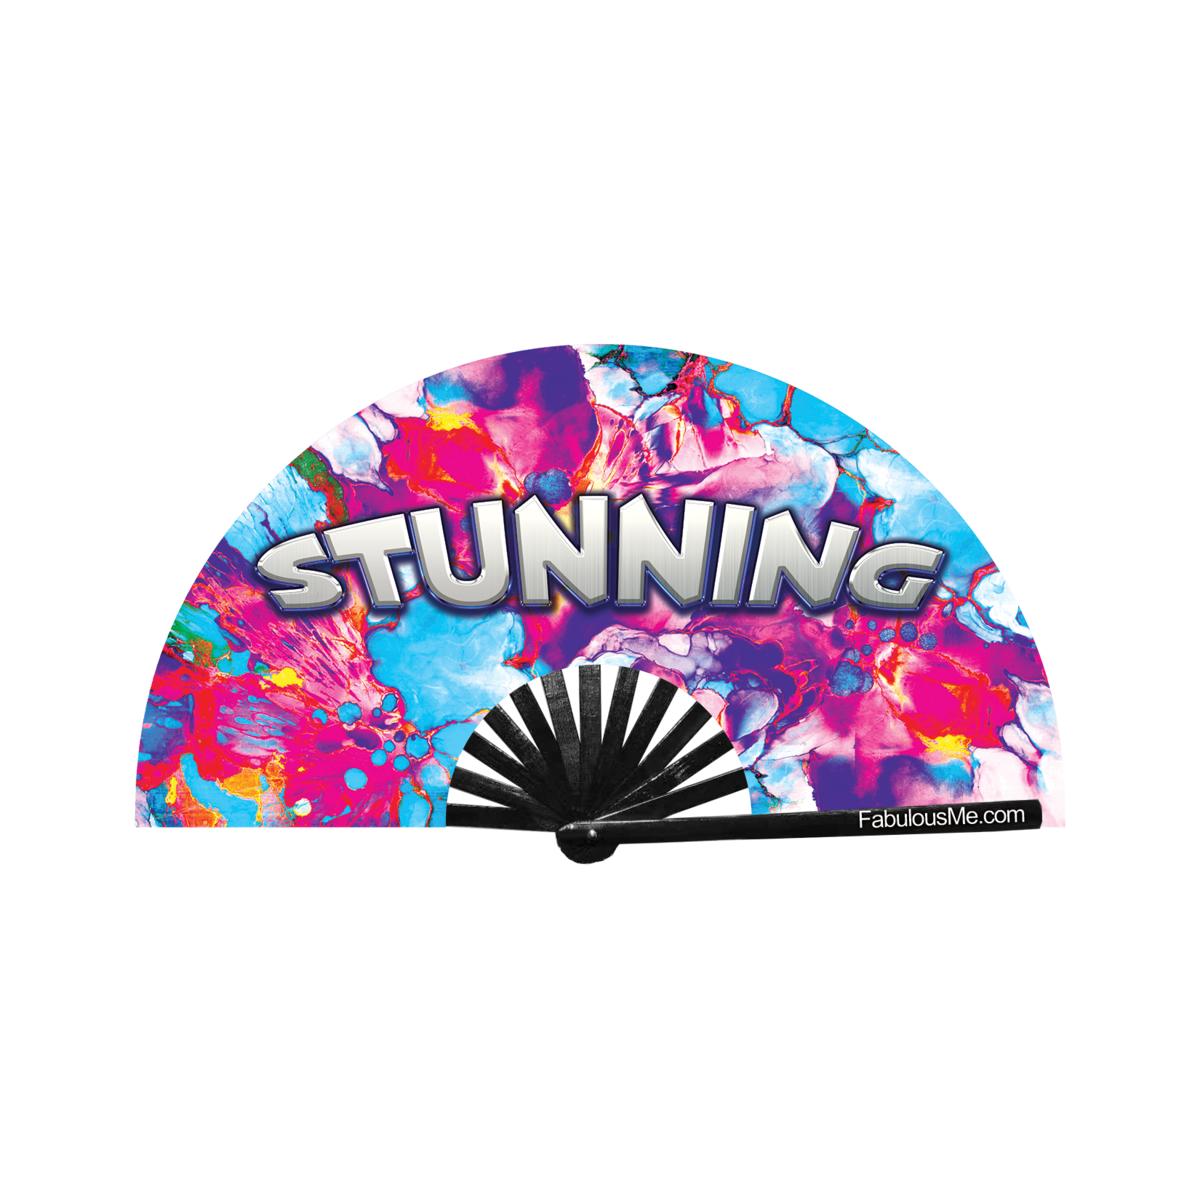 JJMalibu Stunning Fan (UV Glow)